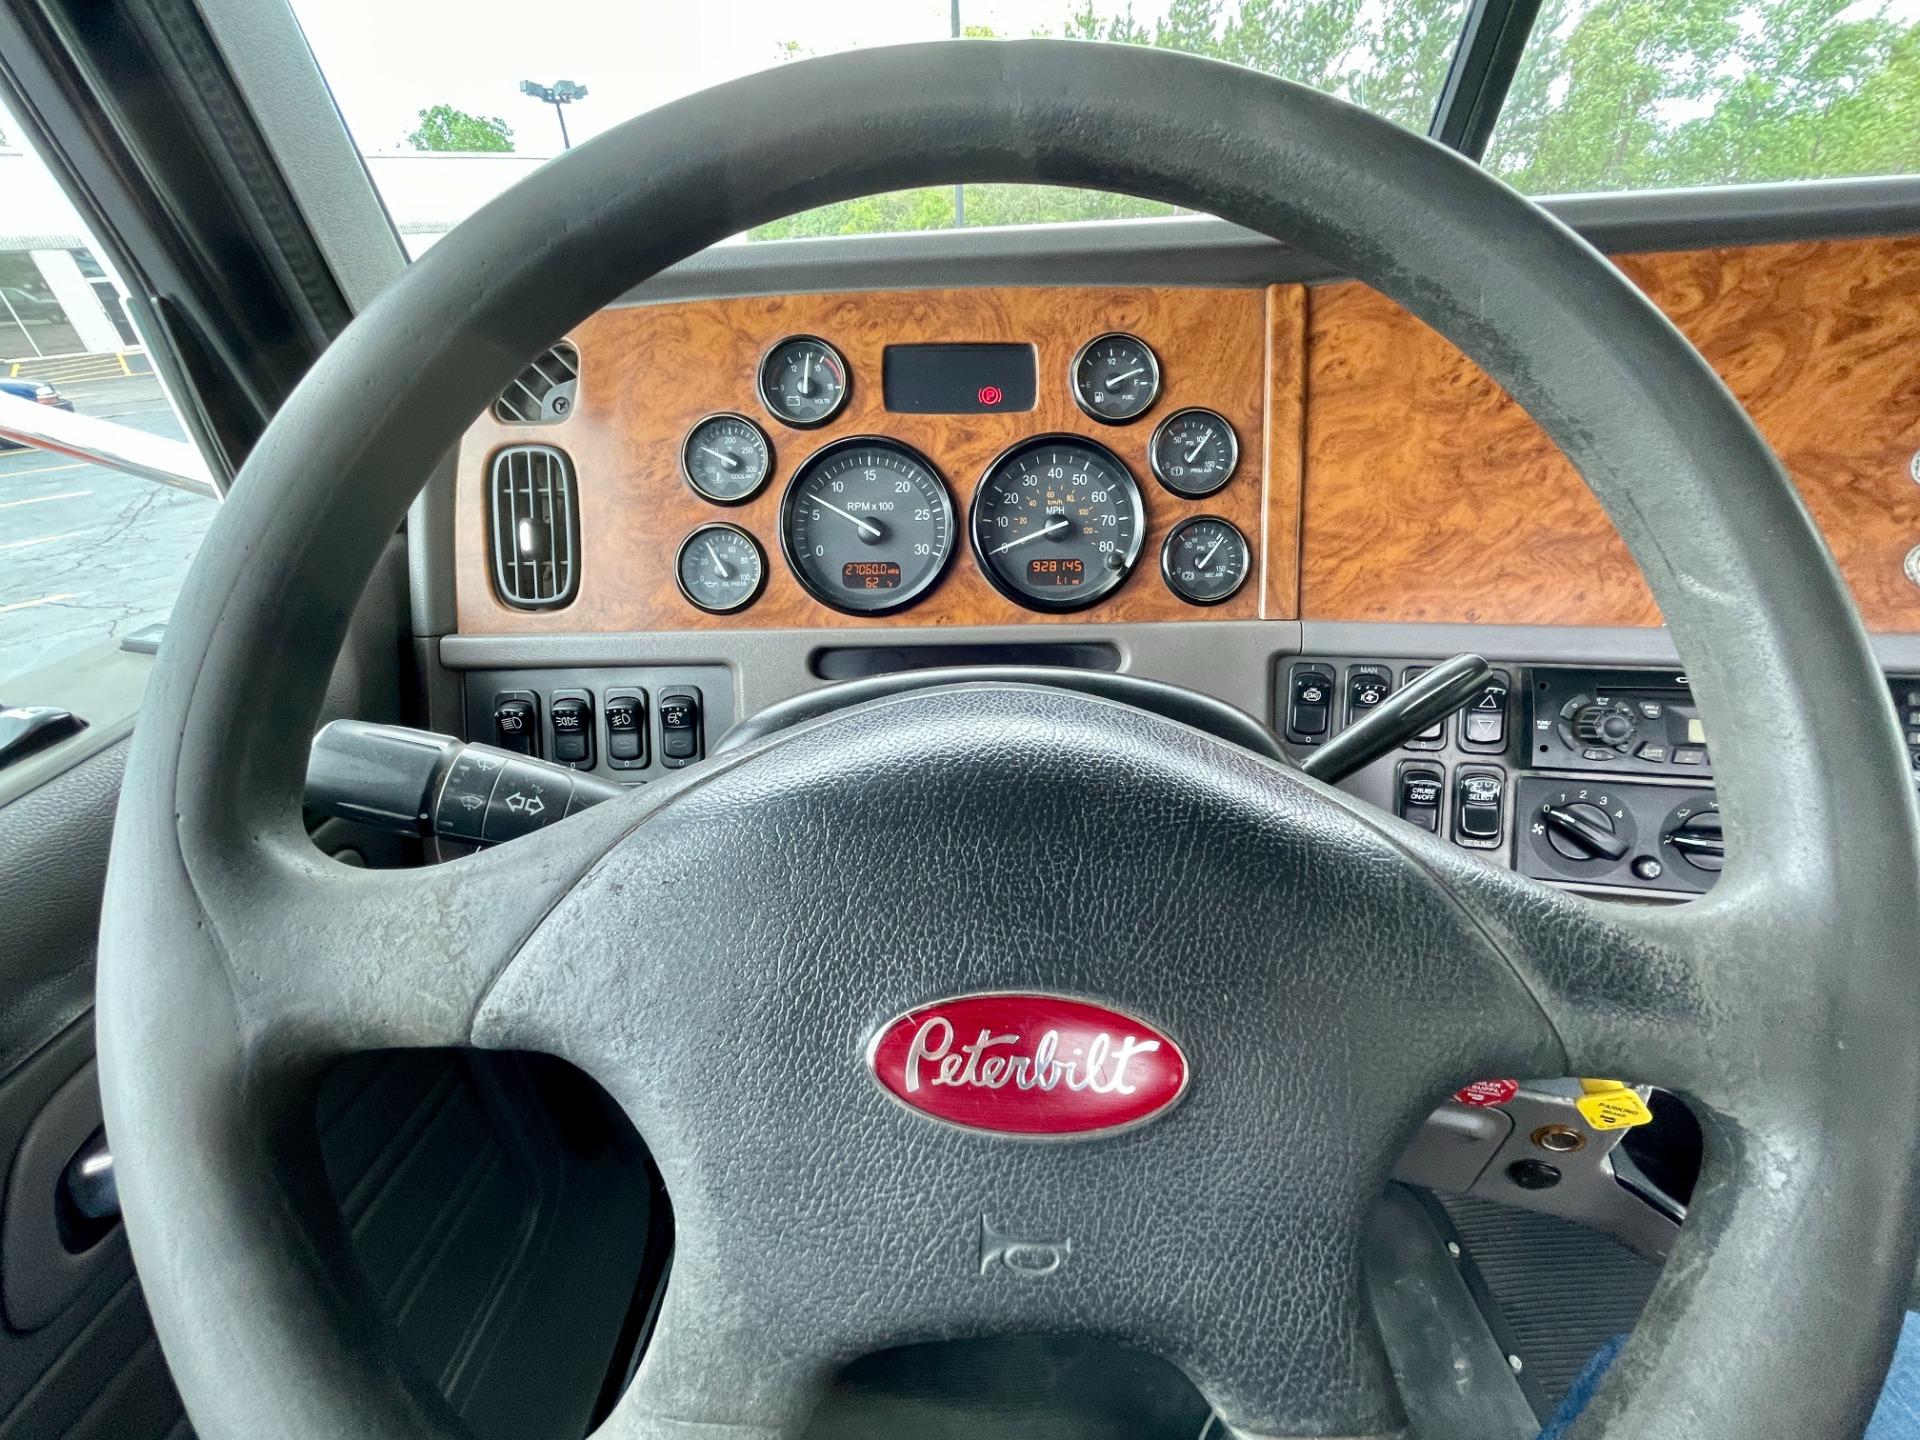 Used-2006-Peterbilt-378-Day-Cab---Cummins-ISX-Power---10-Speed-Manual---WET-KIT